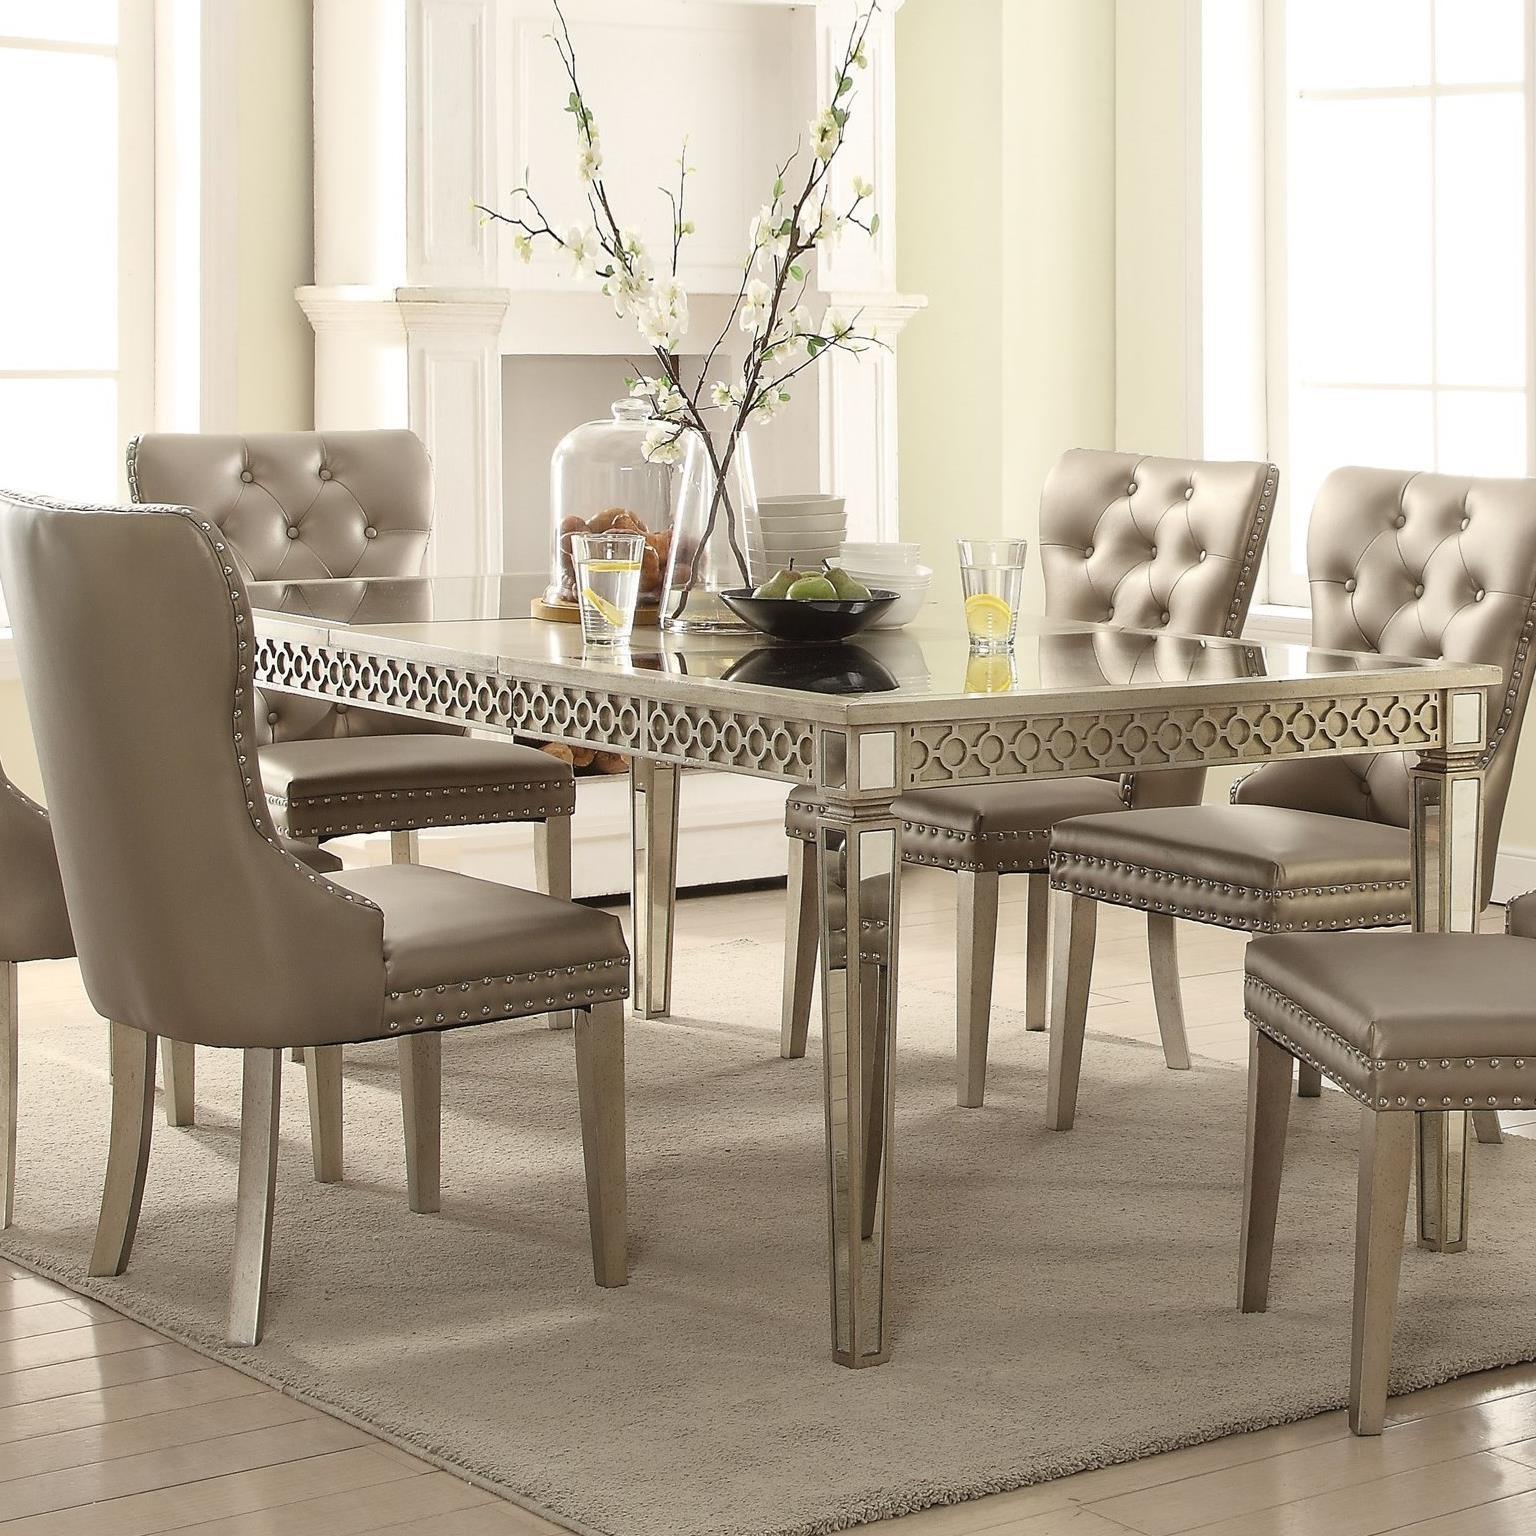 Kacela Dining Table by Acme Furniture at Carolina Direct